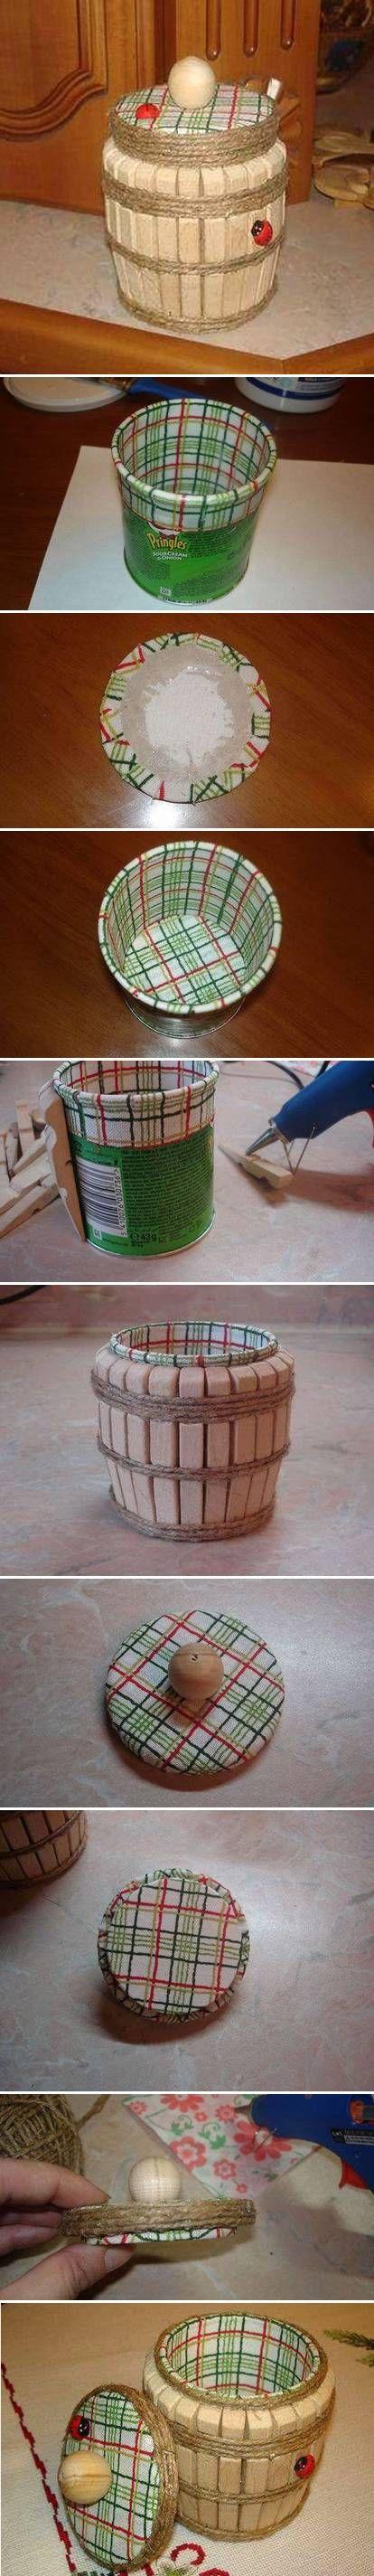 DIY Clothespin Barrel DIY Clothespin Barrel